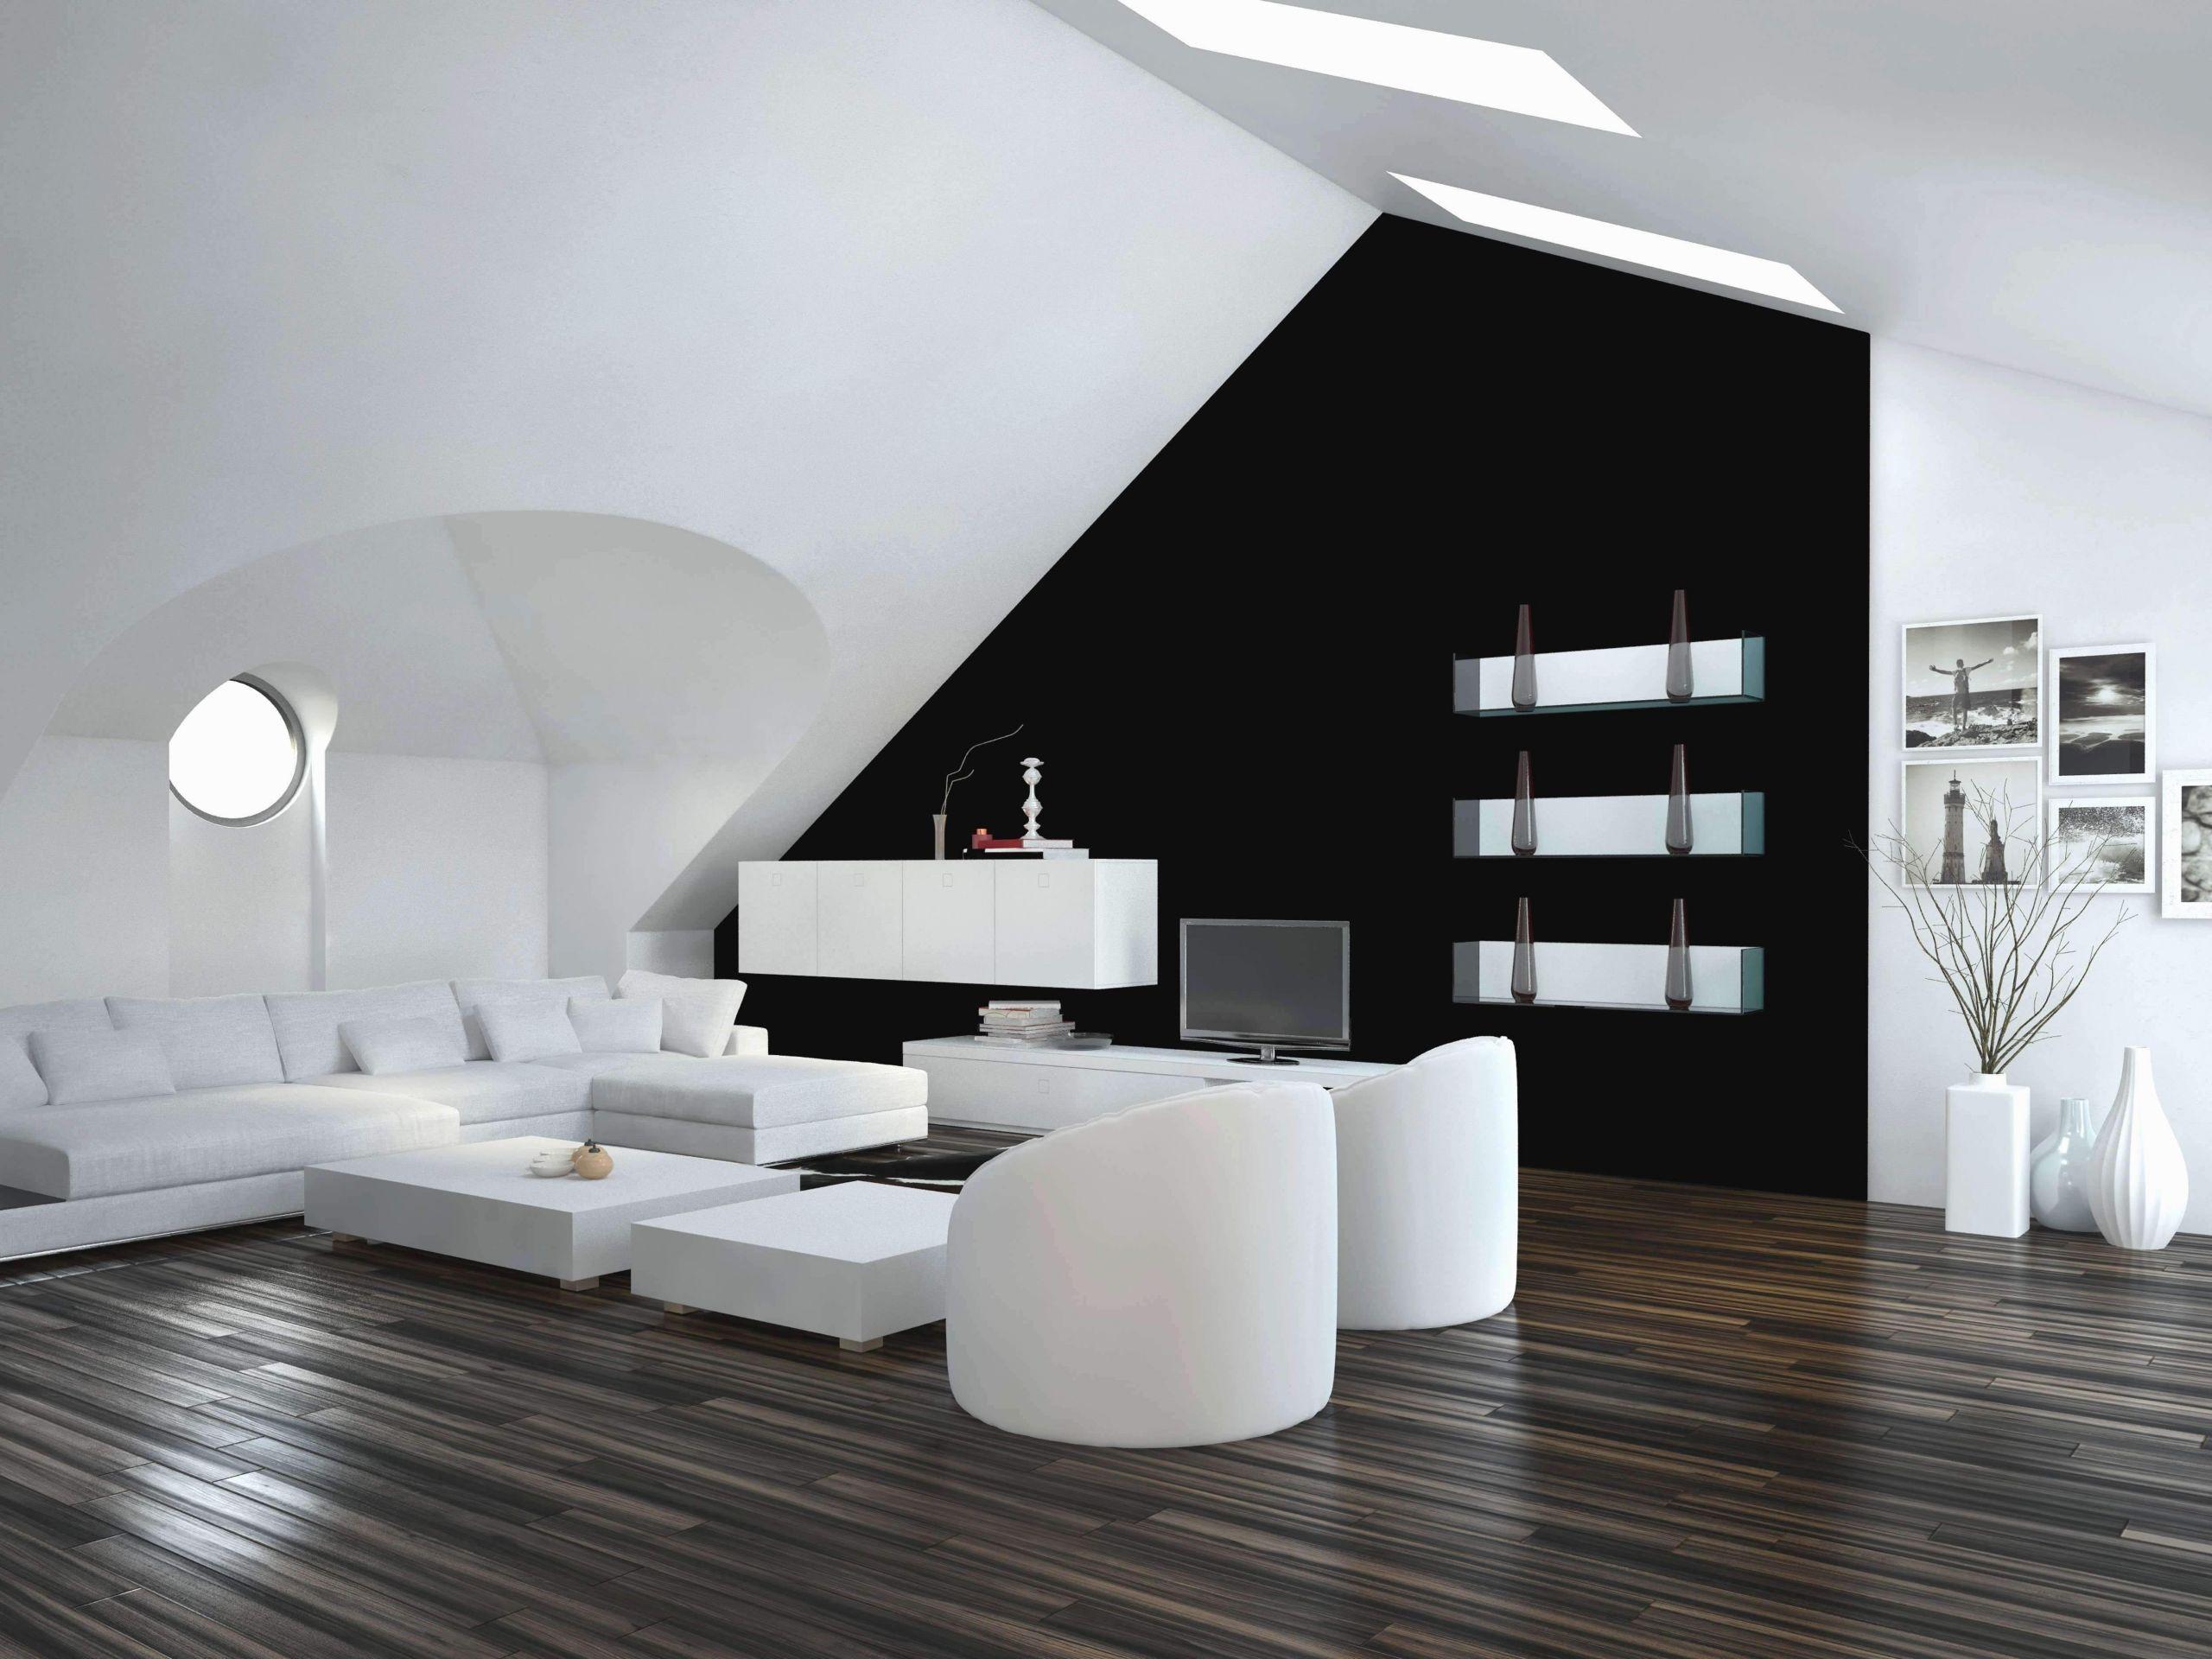 buddha deko wohnzimmer genial genial deko ideen wohnzimmer of buddha deko wohnzimmer scaled